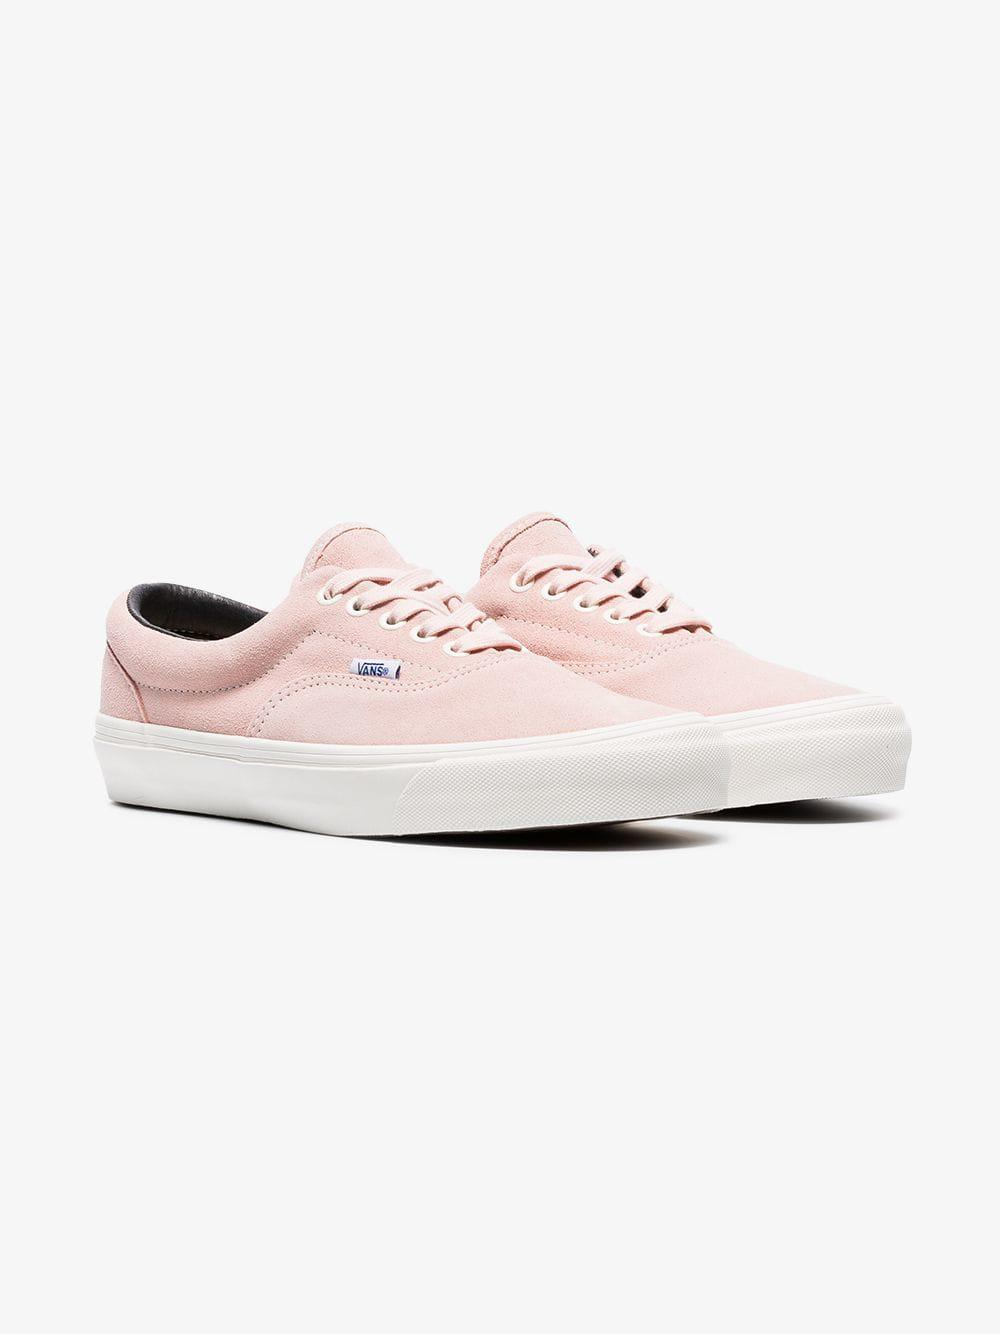 dd85a55164 Lyst - Vans Pink Vault Cotton Low Top Sneakers in Pink for Men